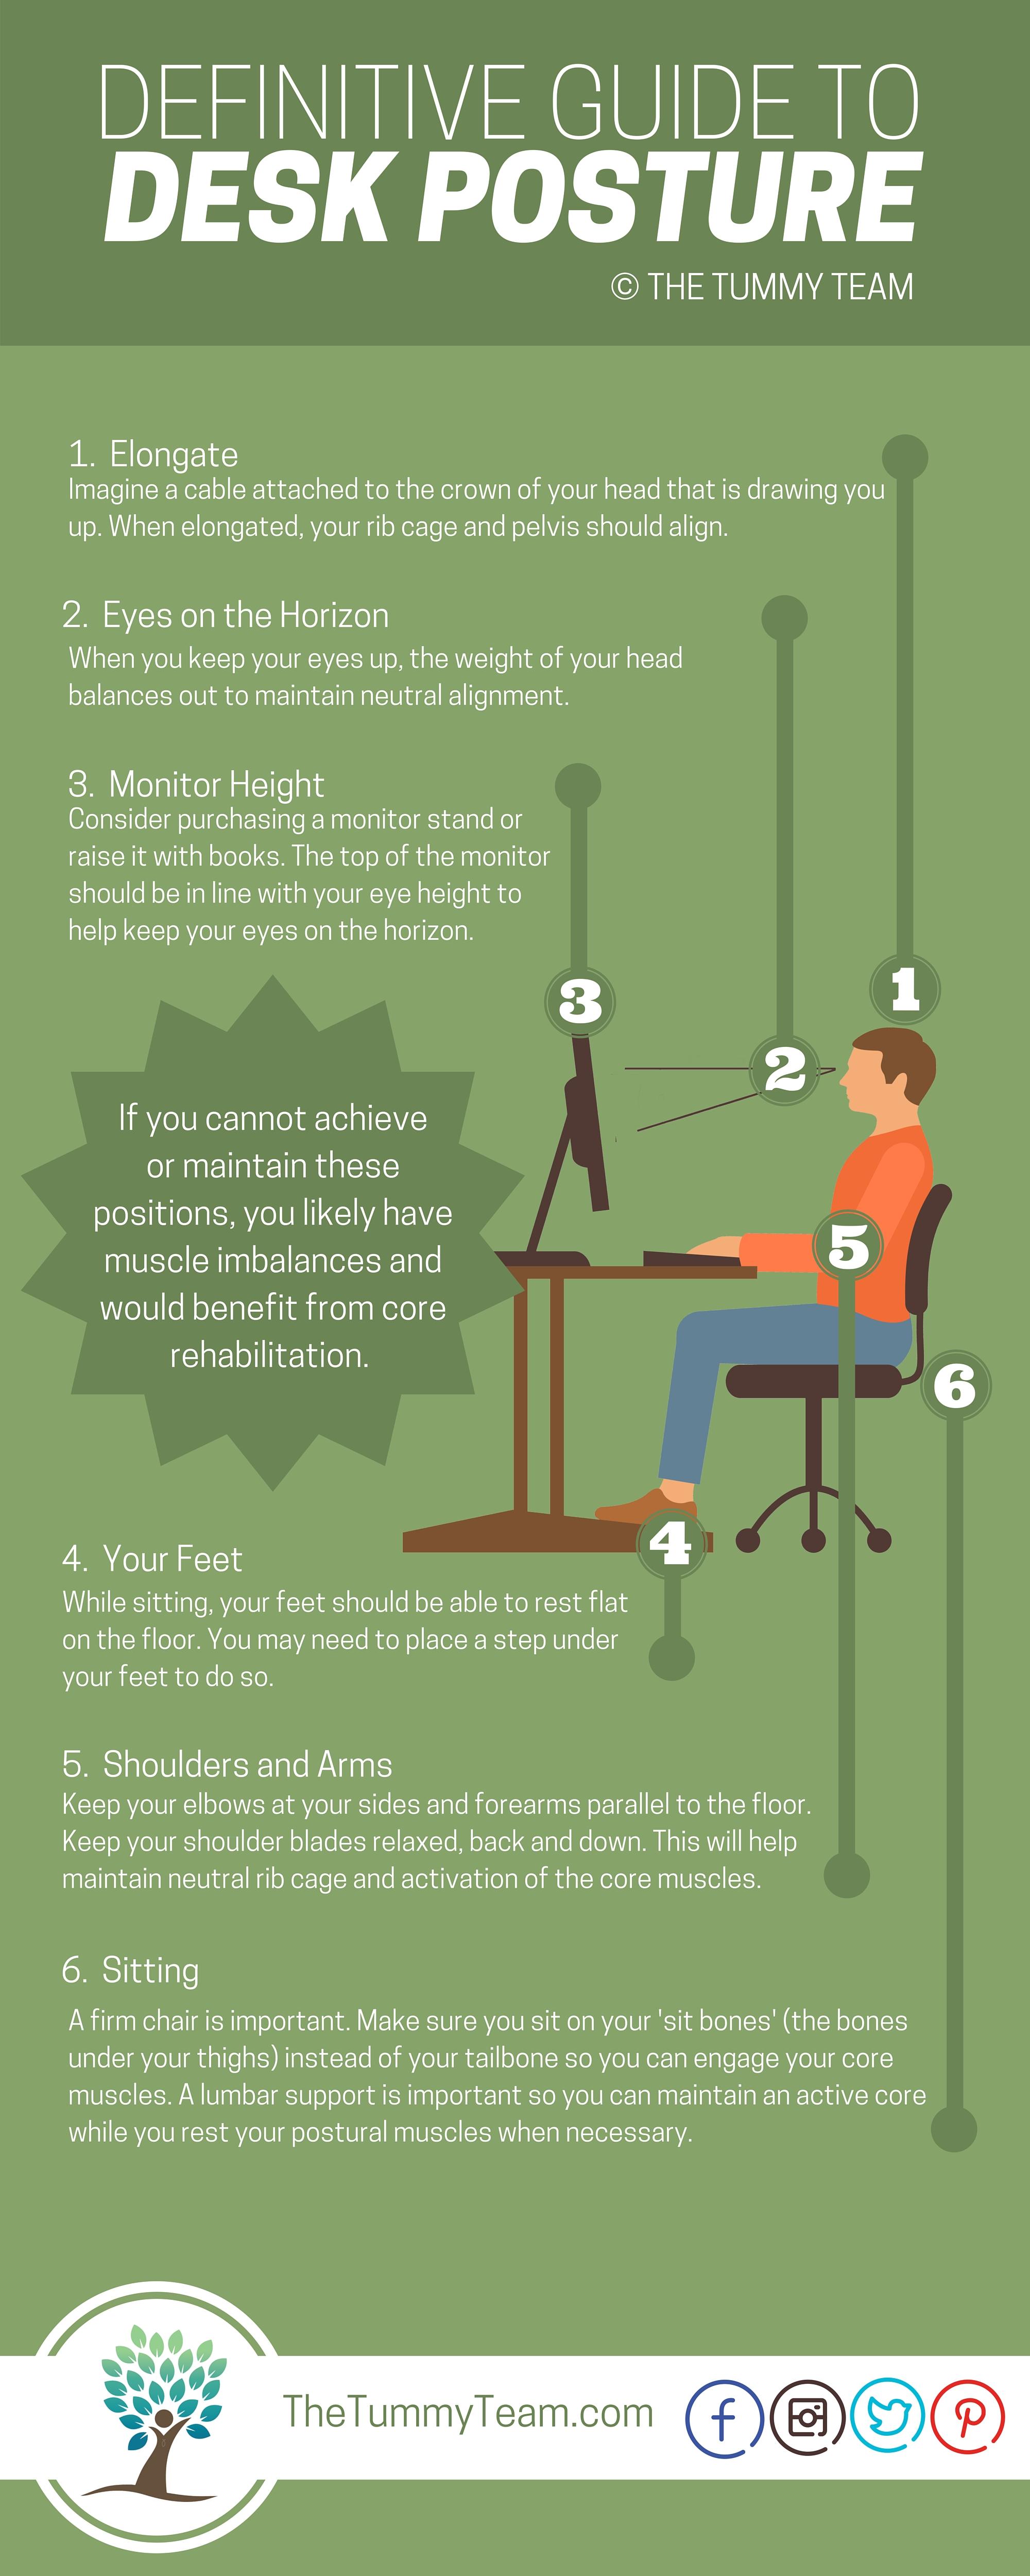 Sitting Desk Posture